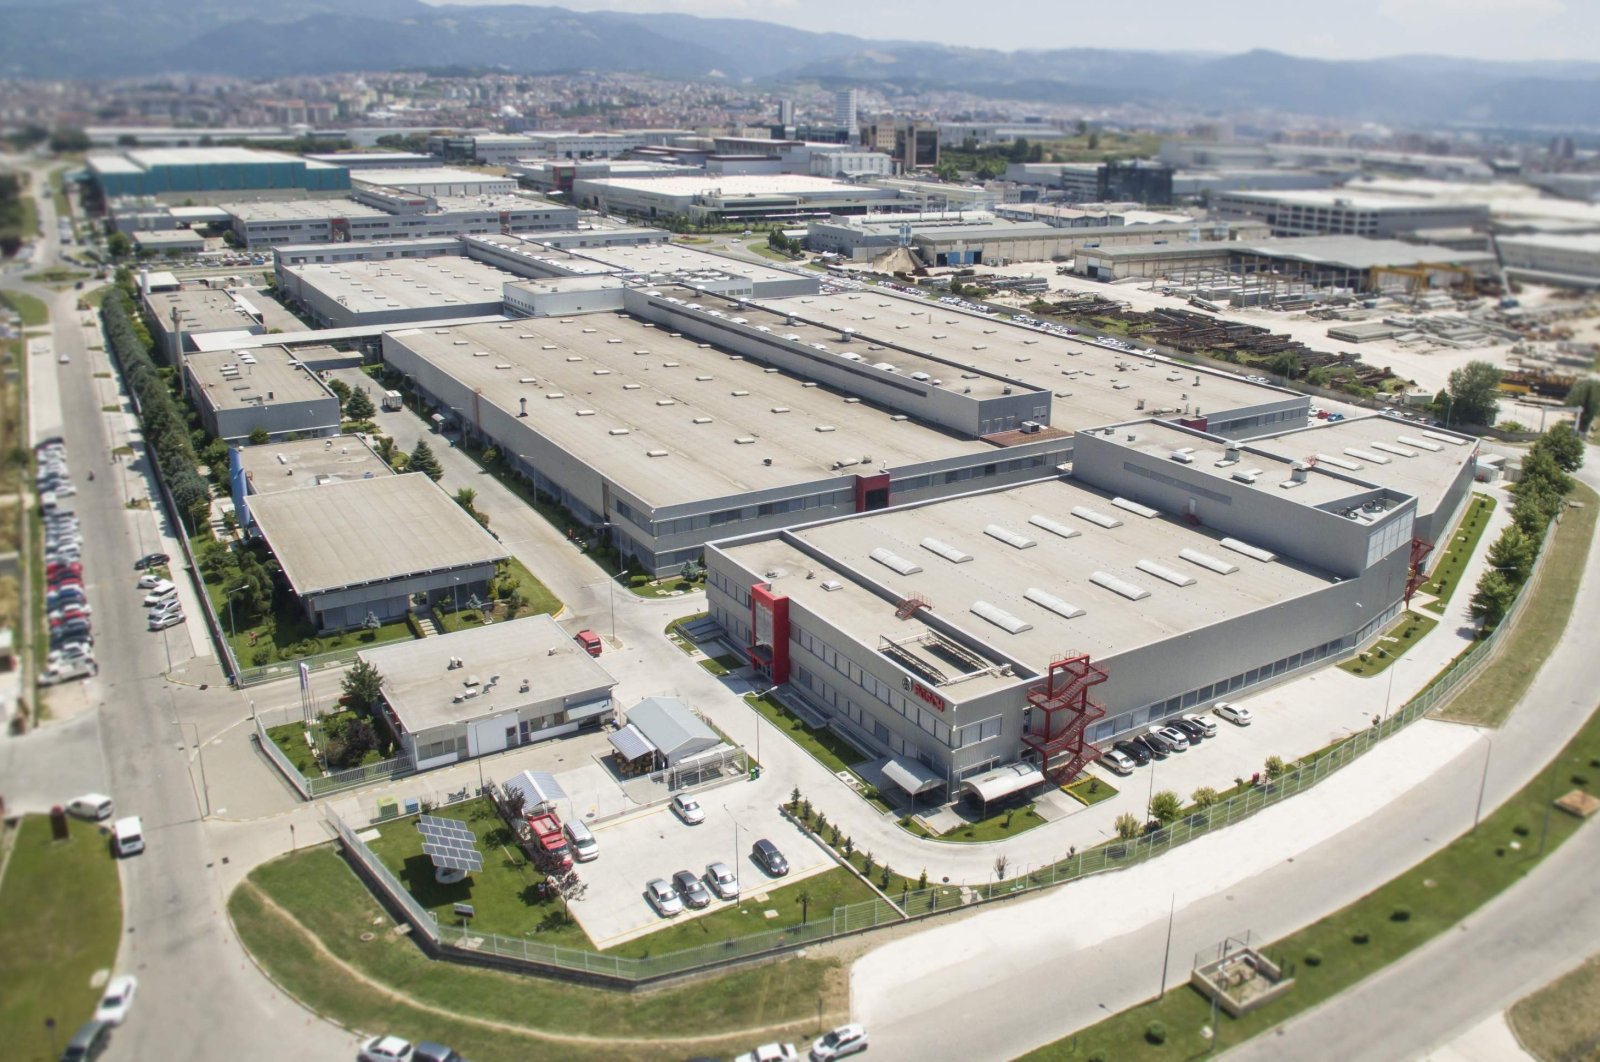 A view of Bosch's factory in Turkey's northwestern Bursa province, July 20, 2017. (İHA Photo)